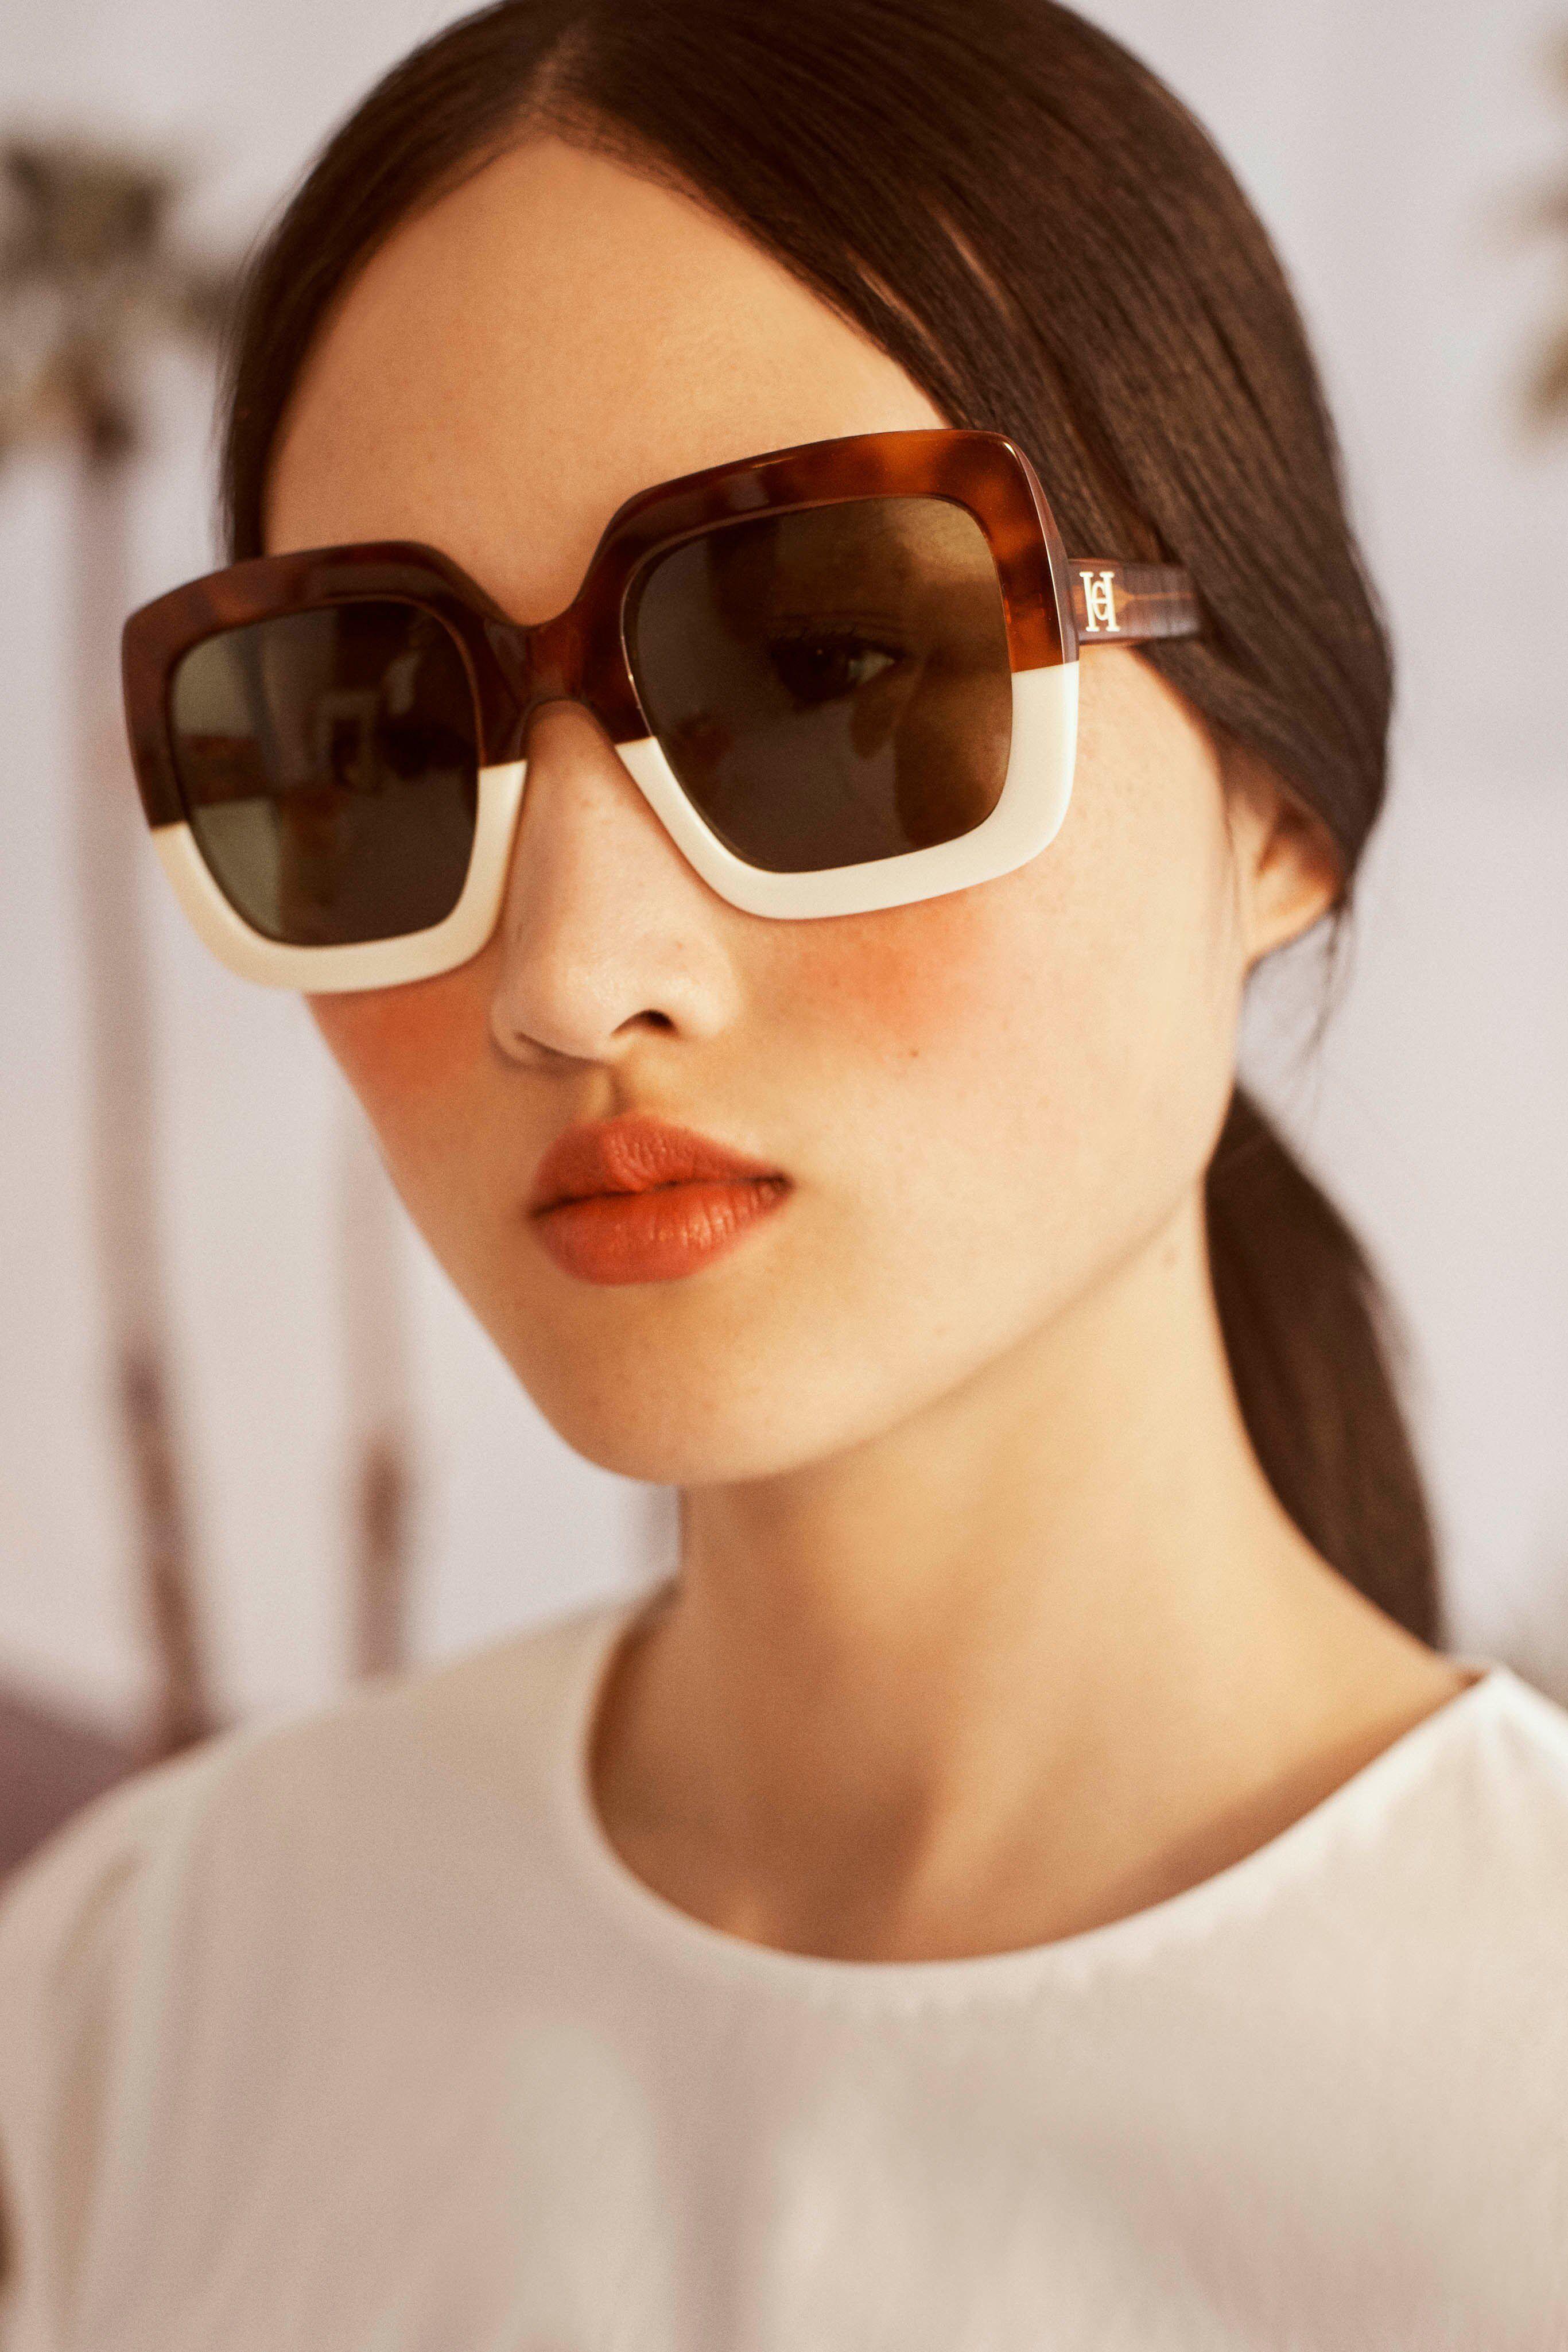 Carolina Herrera Resort  Fashion Show Collection See the